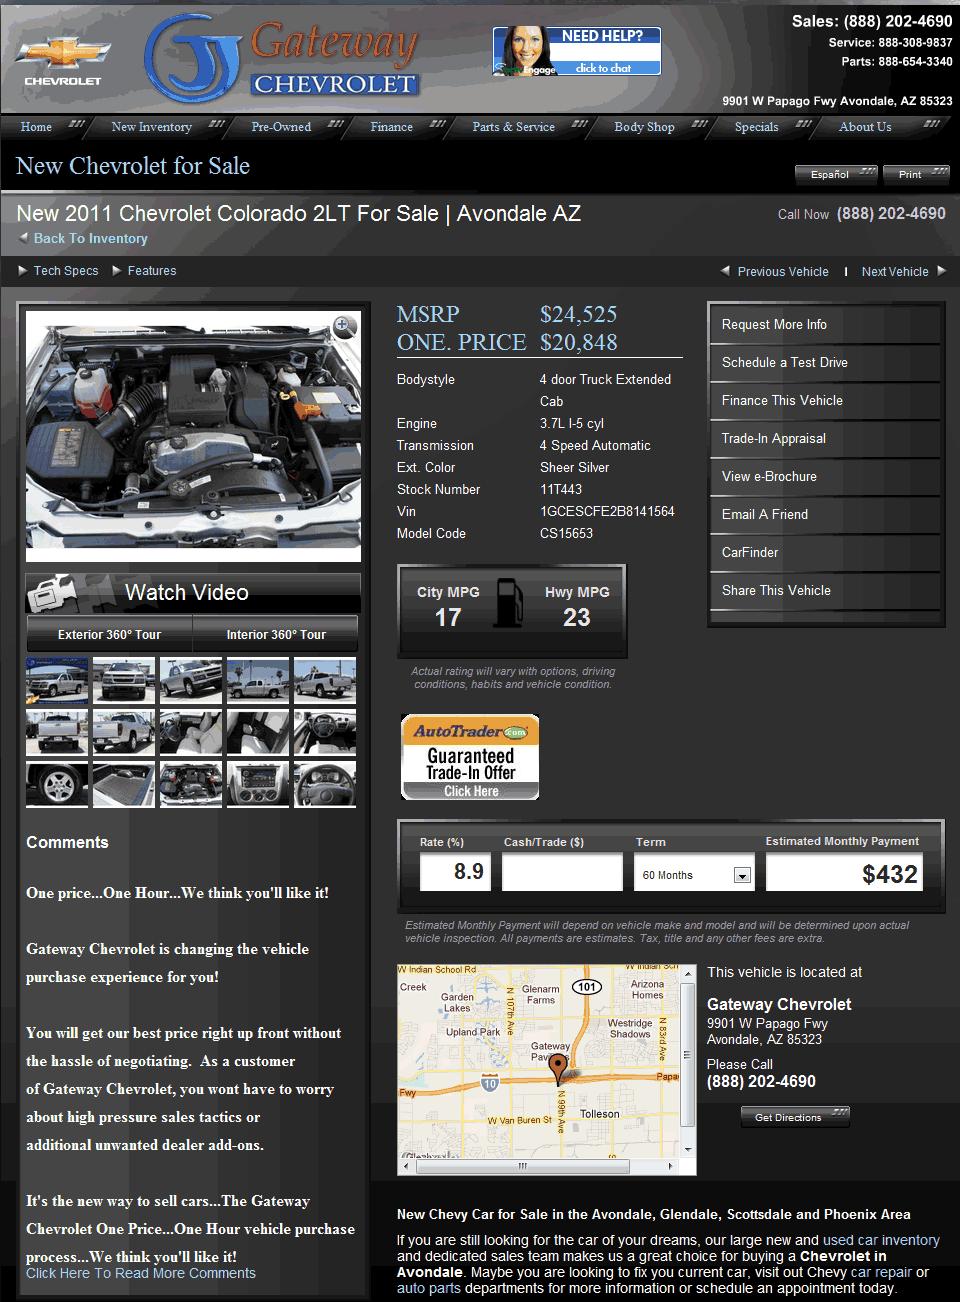 Gateway Chevrolet Avondale, AZ View Dealer Ad